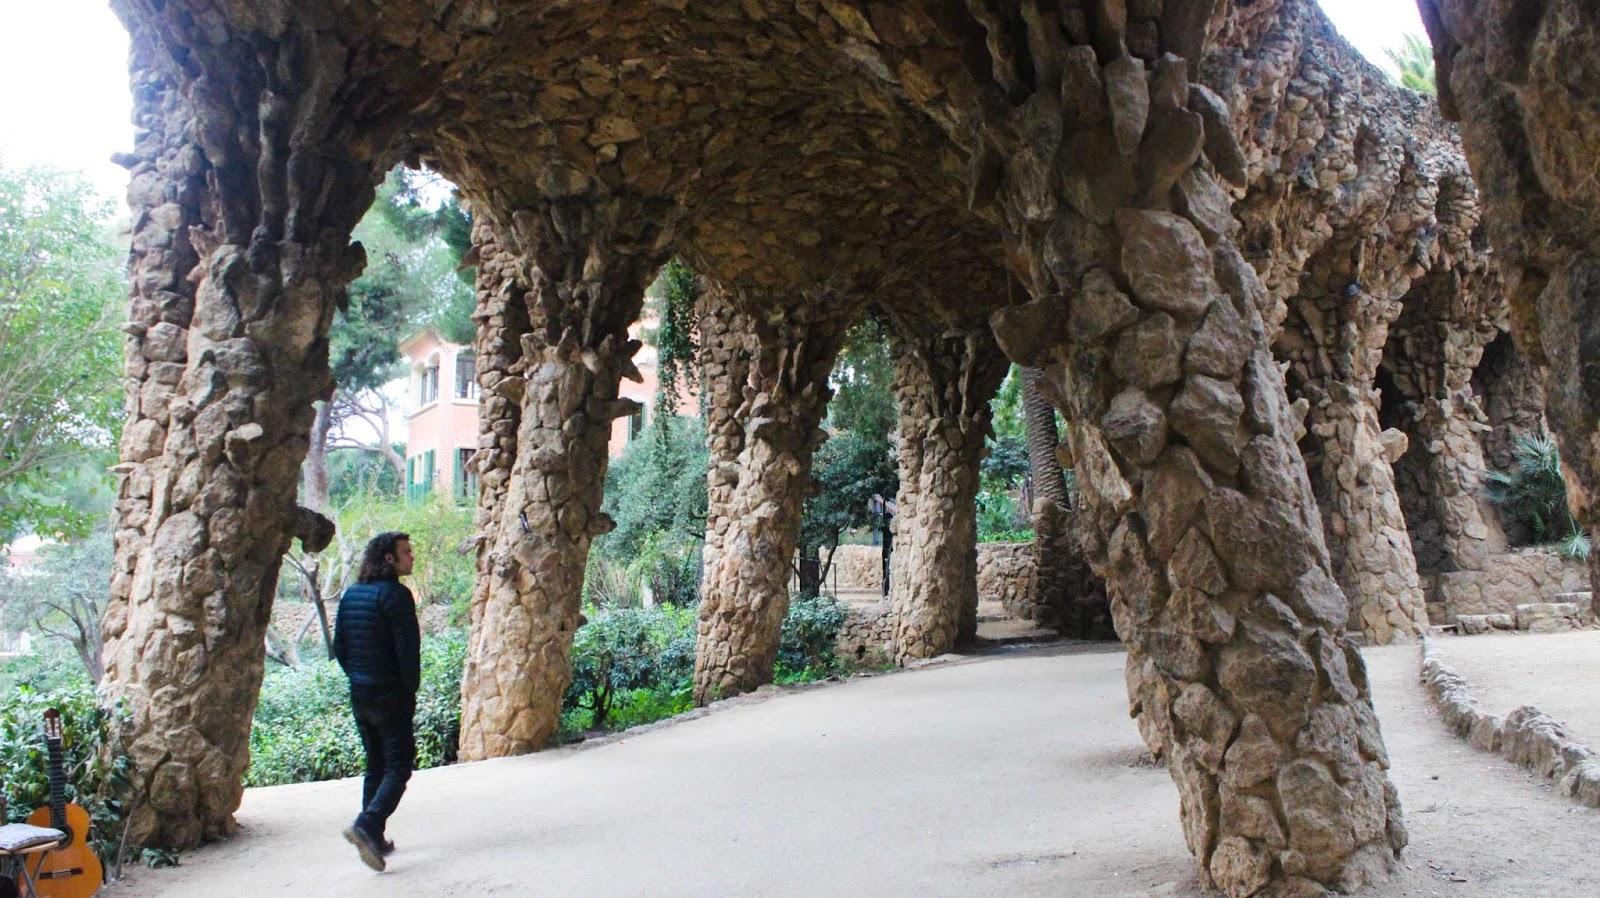 Barcleona Getaway Park Guell